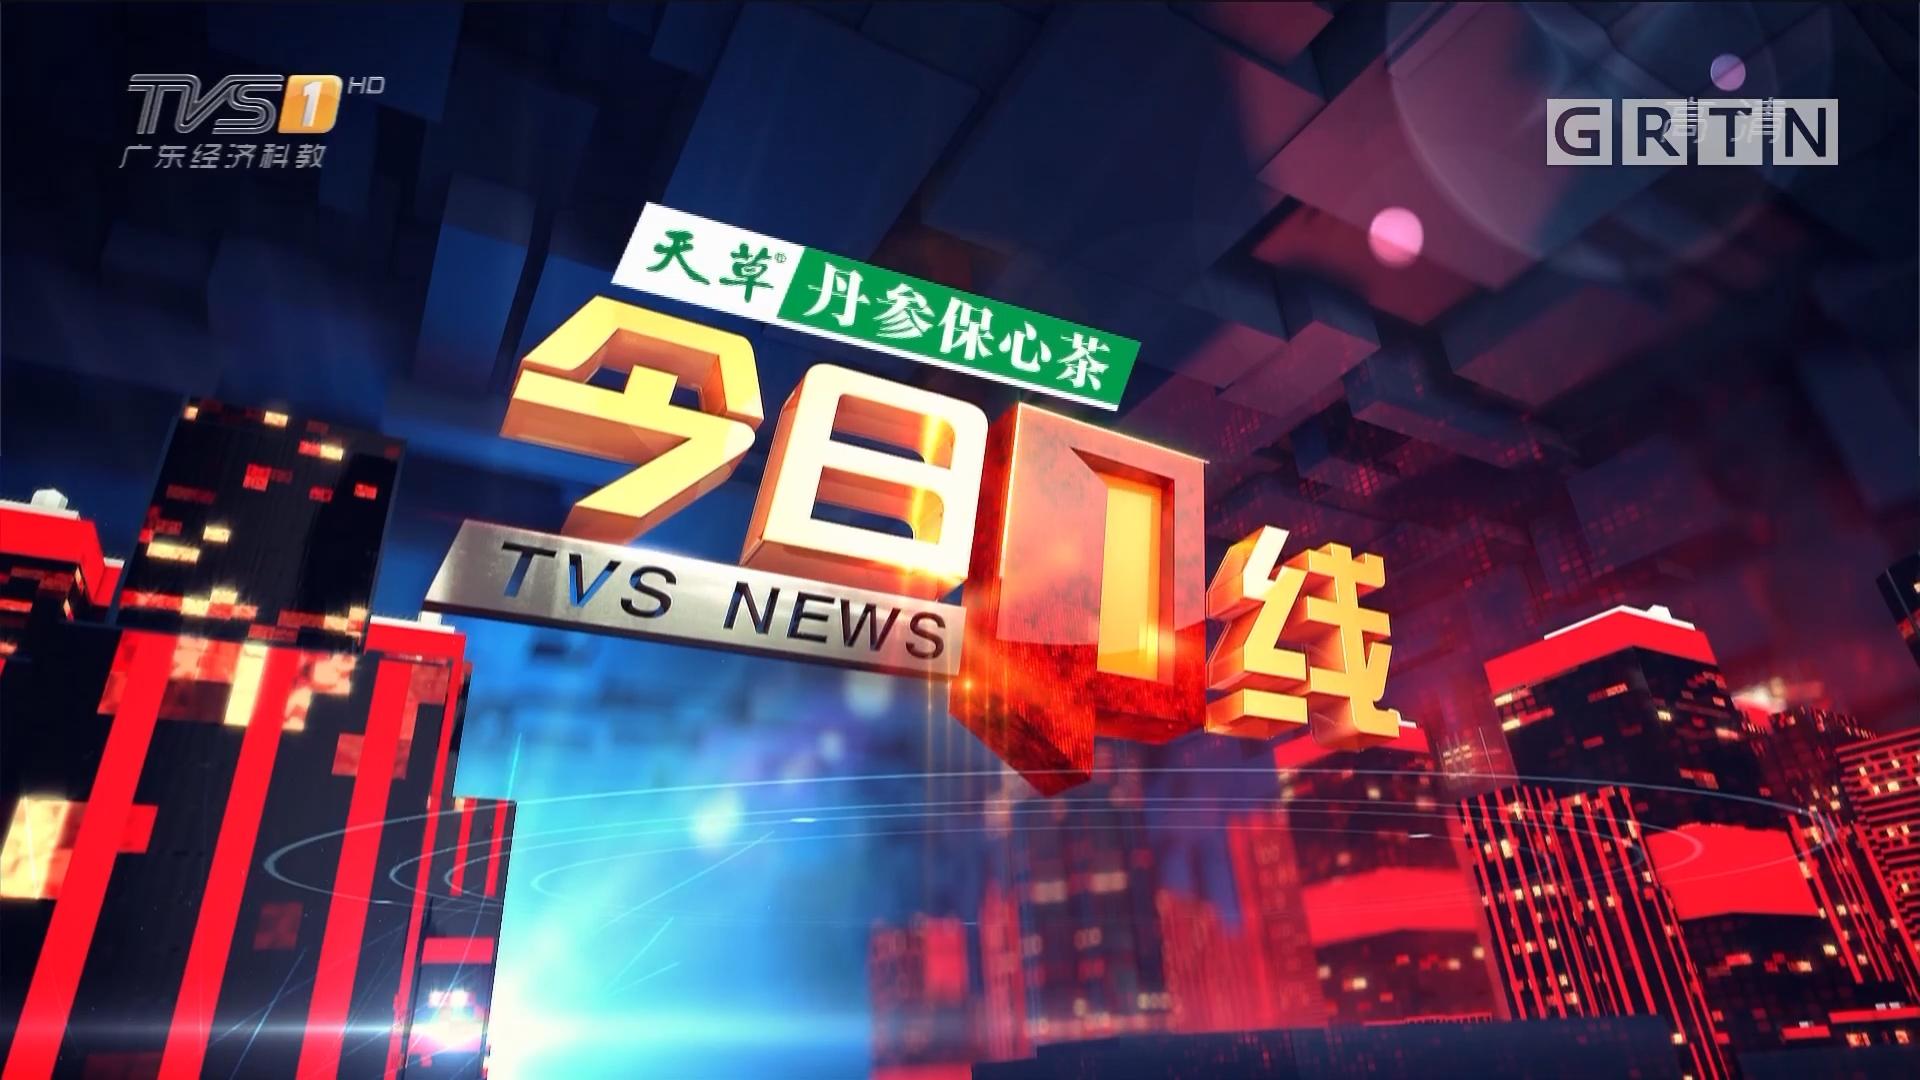 [HD][2017-07-17]今日一线:潮州:警察暴力执法拦截摩托车?谣传!